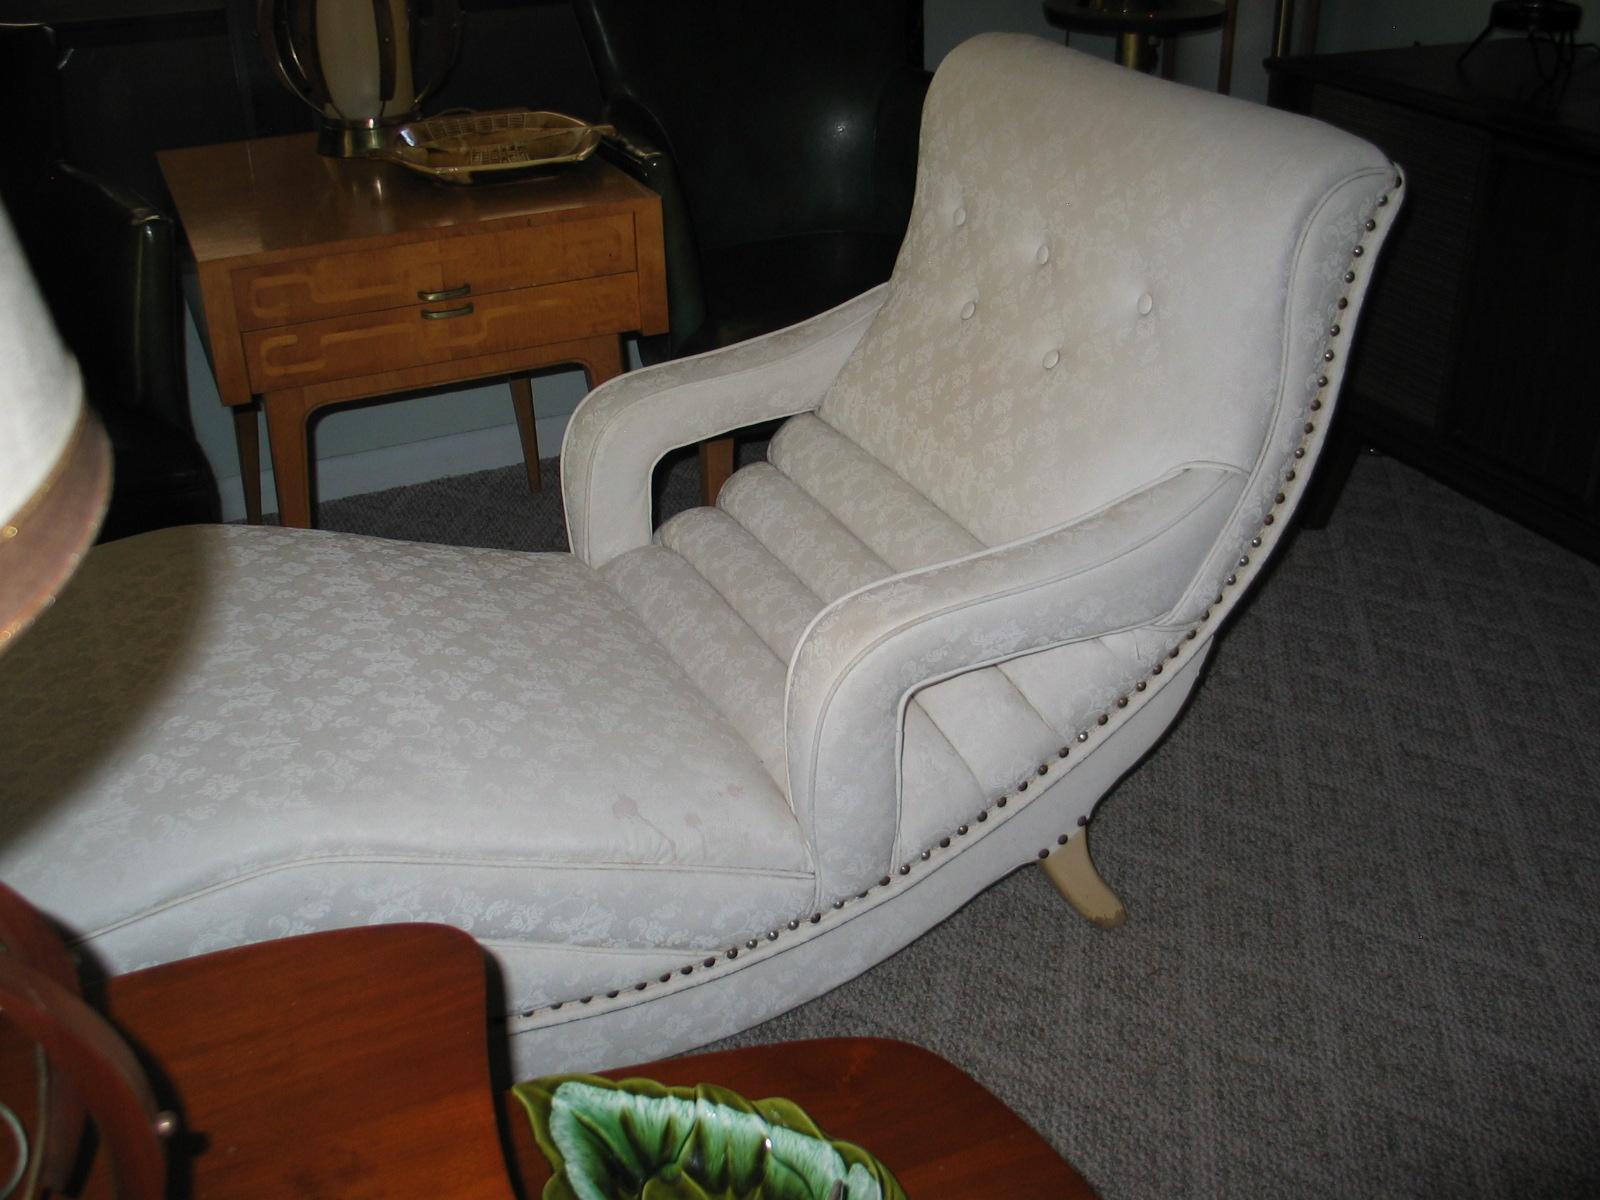 Sensational Daves Mid Century Stuff Lets Identify This Contour Chair Creativecarmelina Interior Chair Design Creativecarmelinacom